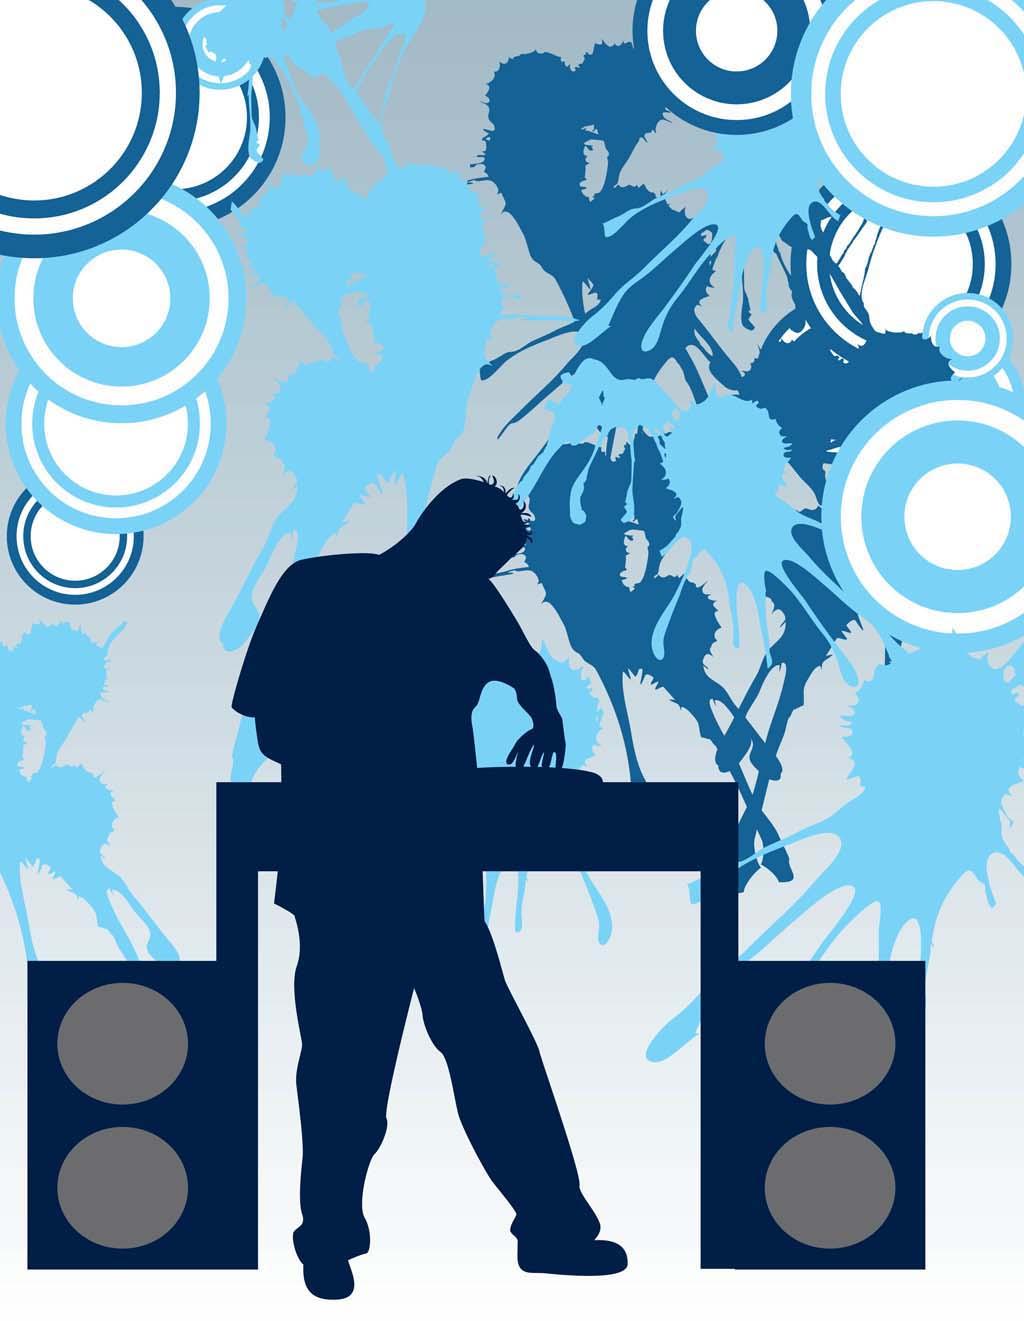 DJ clipart the mix Dj Party Clipart